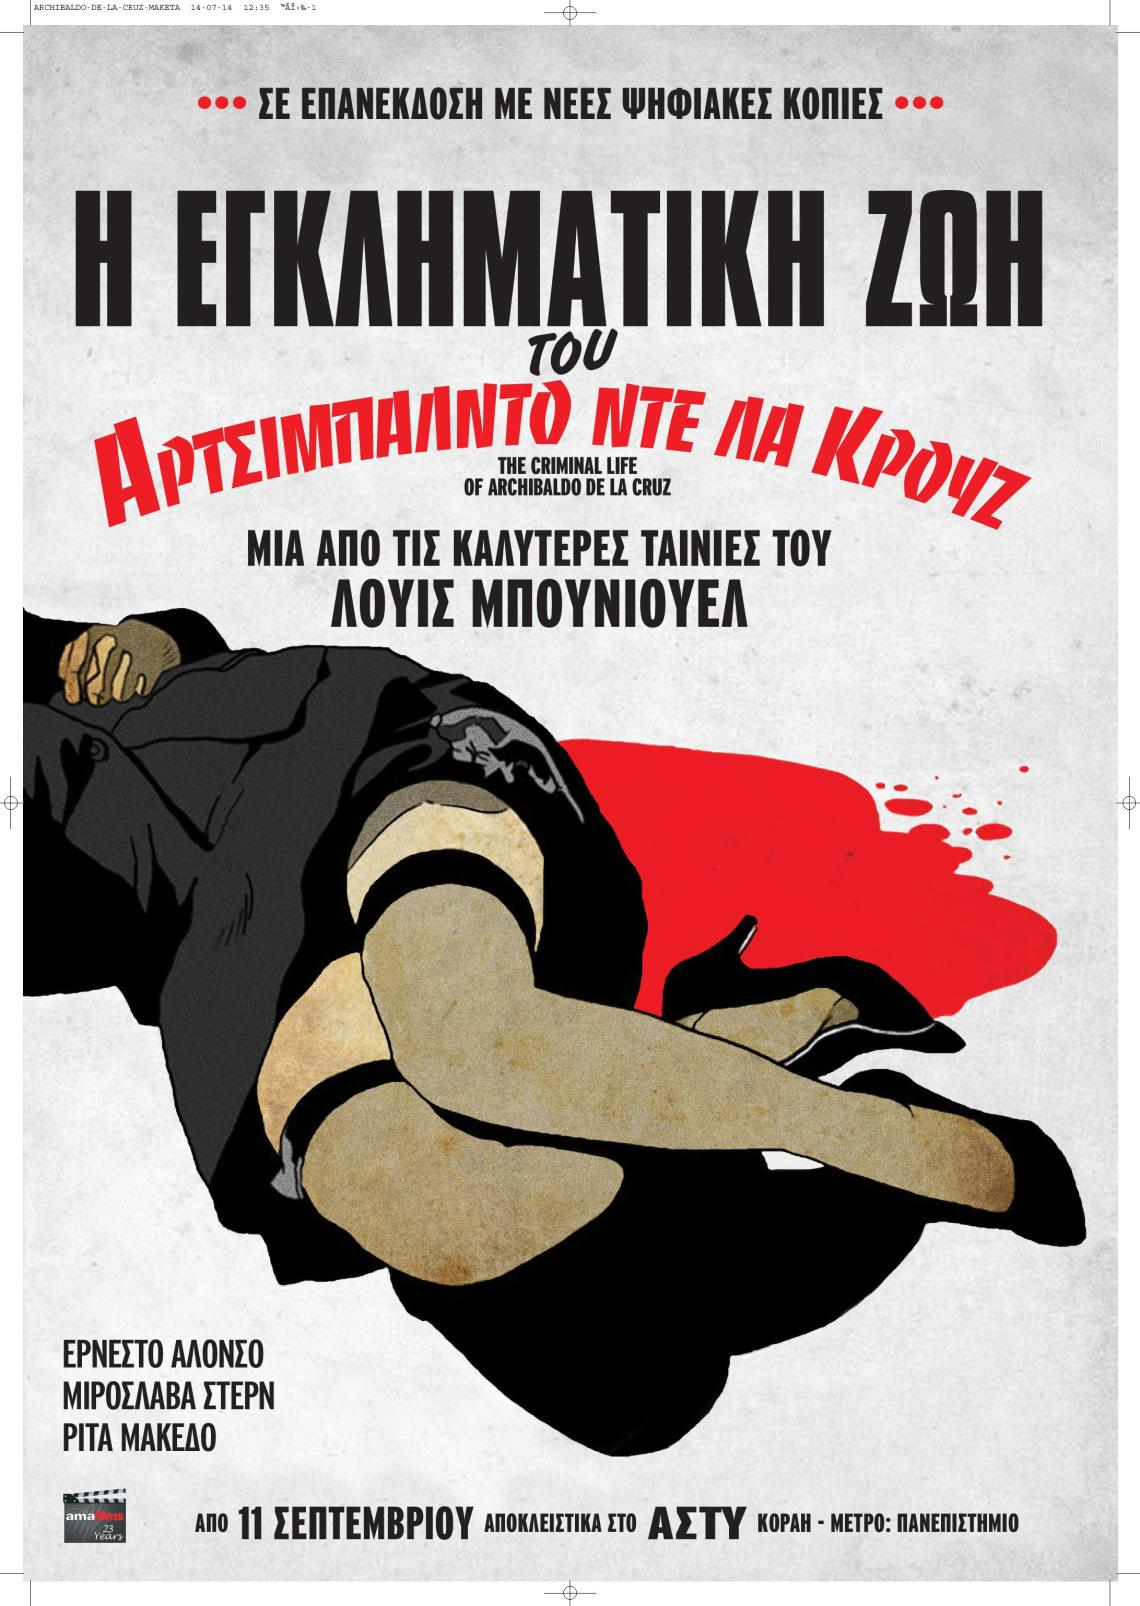 The-Criminal-Life-of-Archibaldo-de-la-Cruz-1955-01